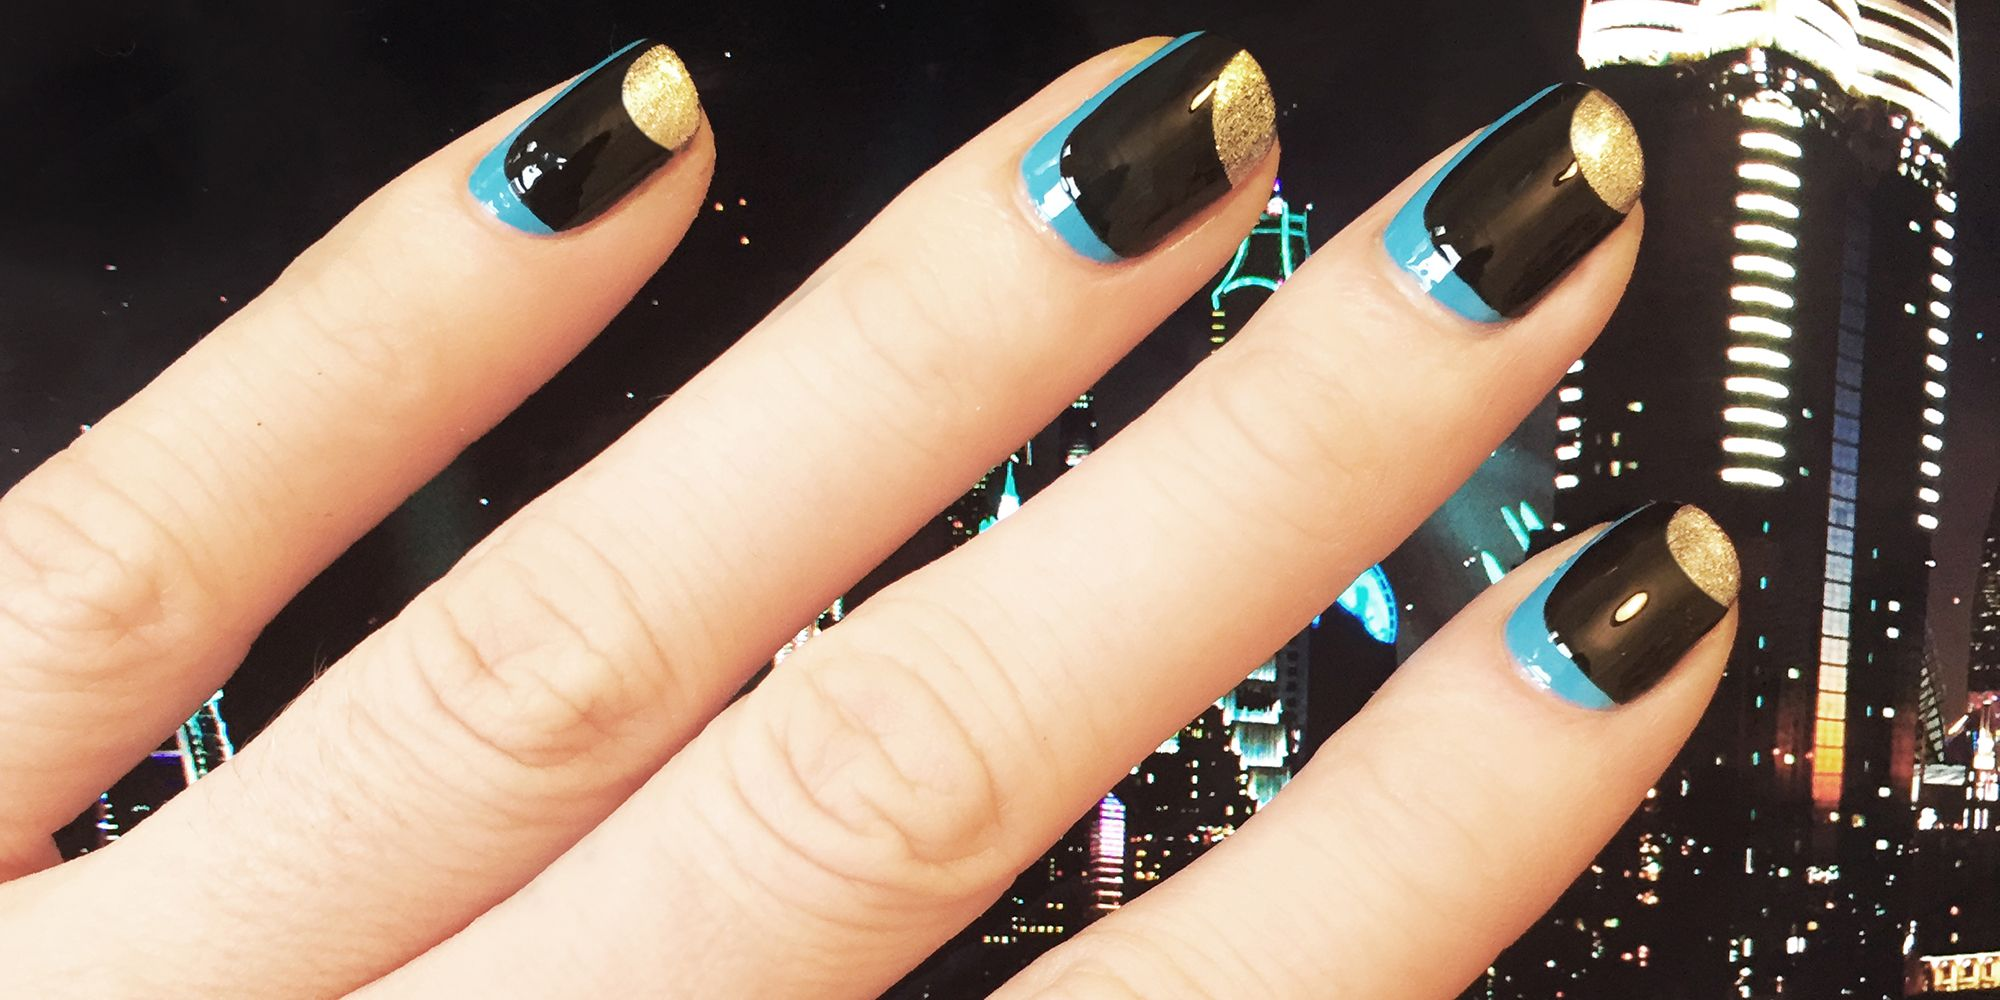 Full color nail art - Nail Art How To Dubai Meets Stella Mccartney Spring 2016 Spring 2016 Nail Ideas